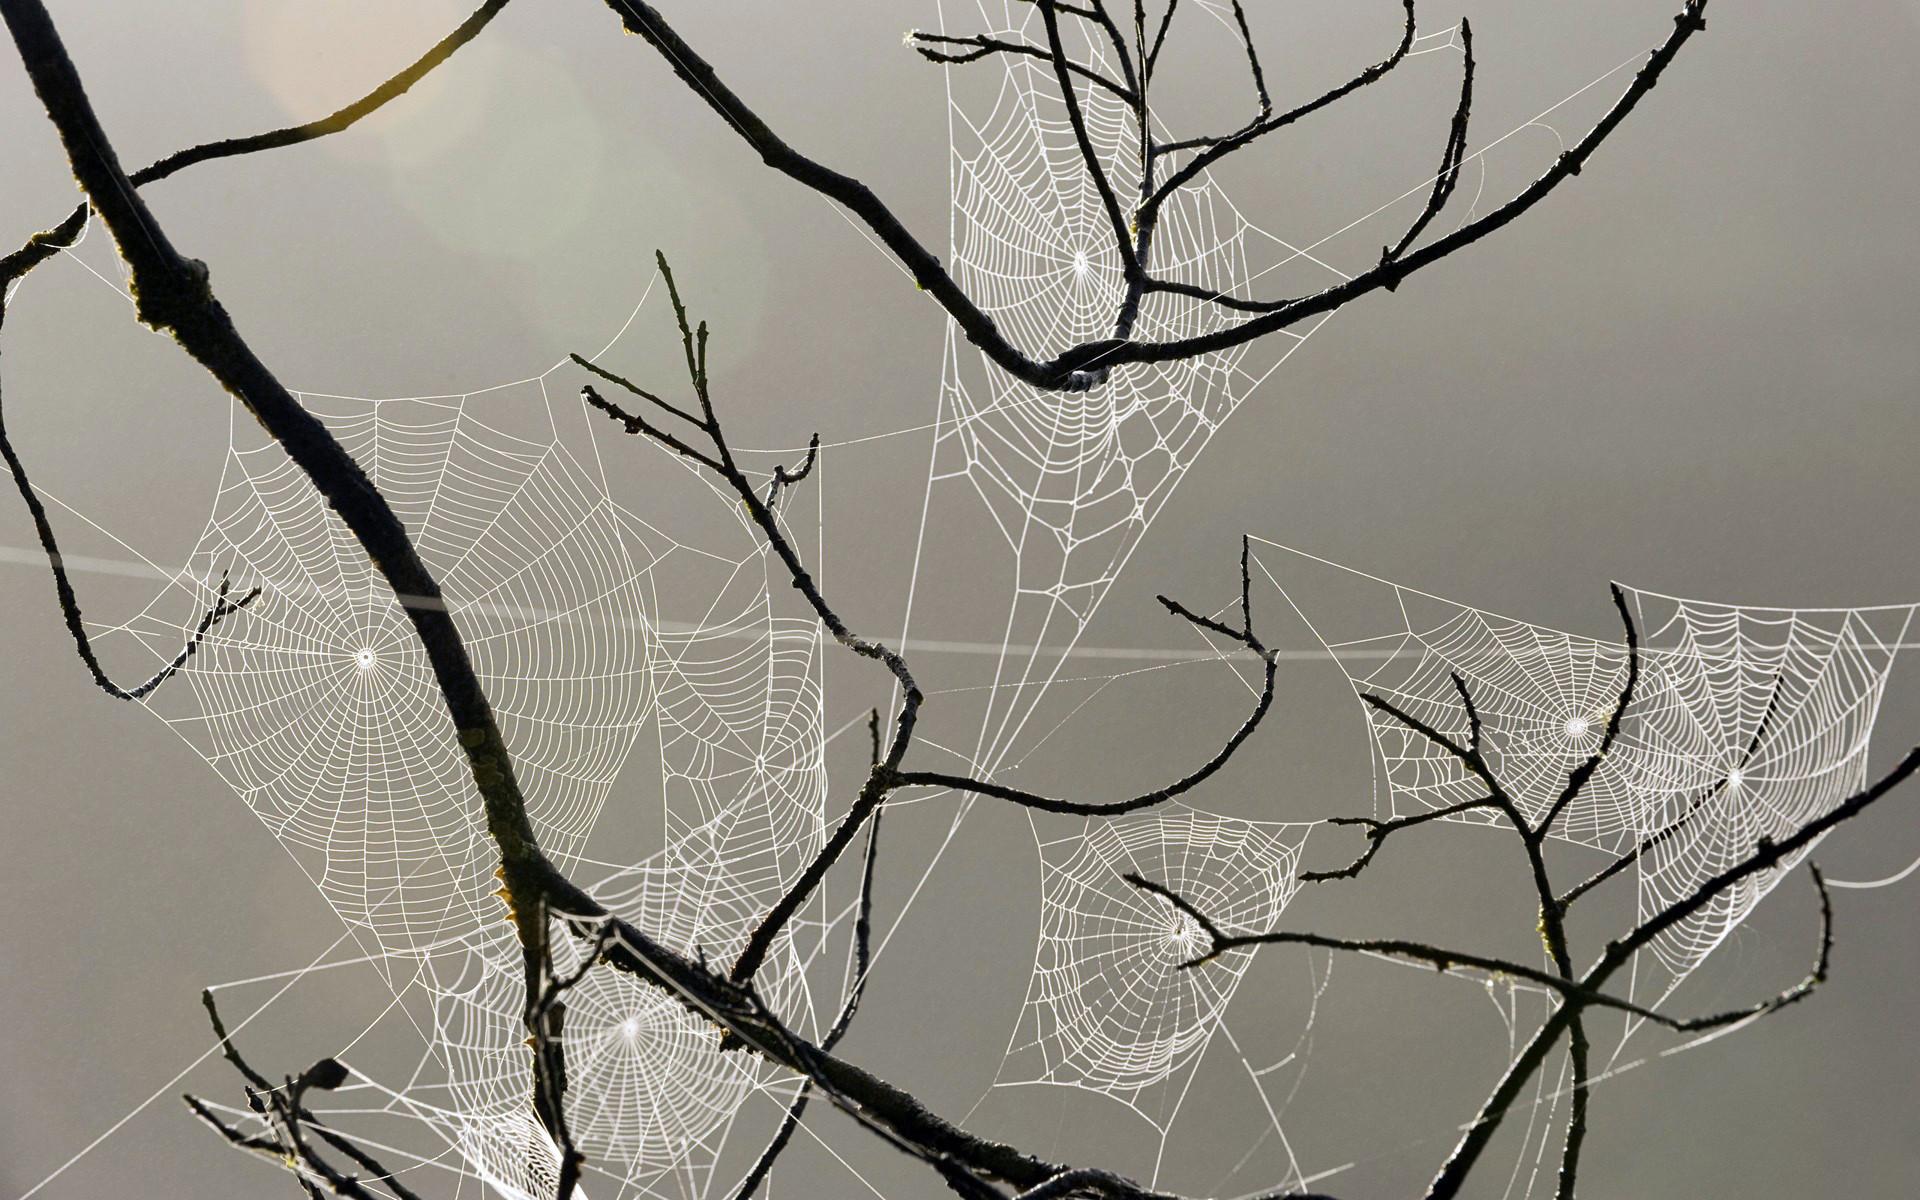 spiderweb webs insects drops dew macro wallpaper